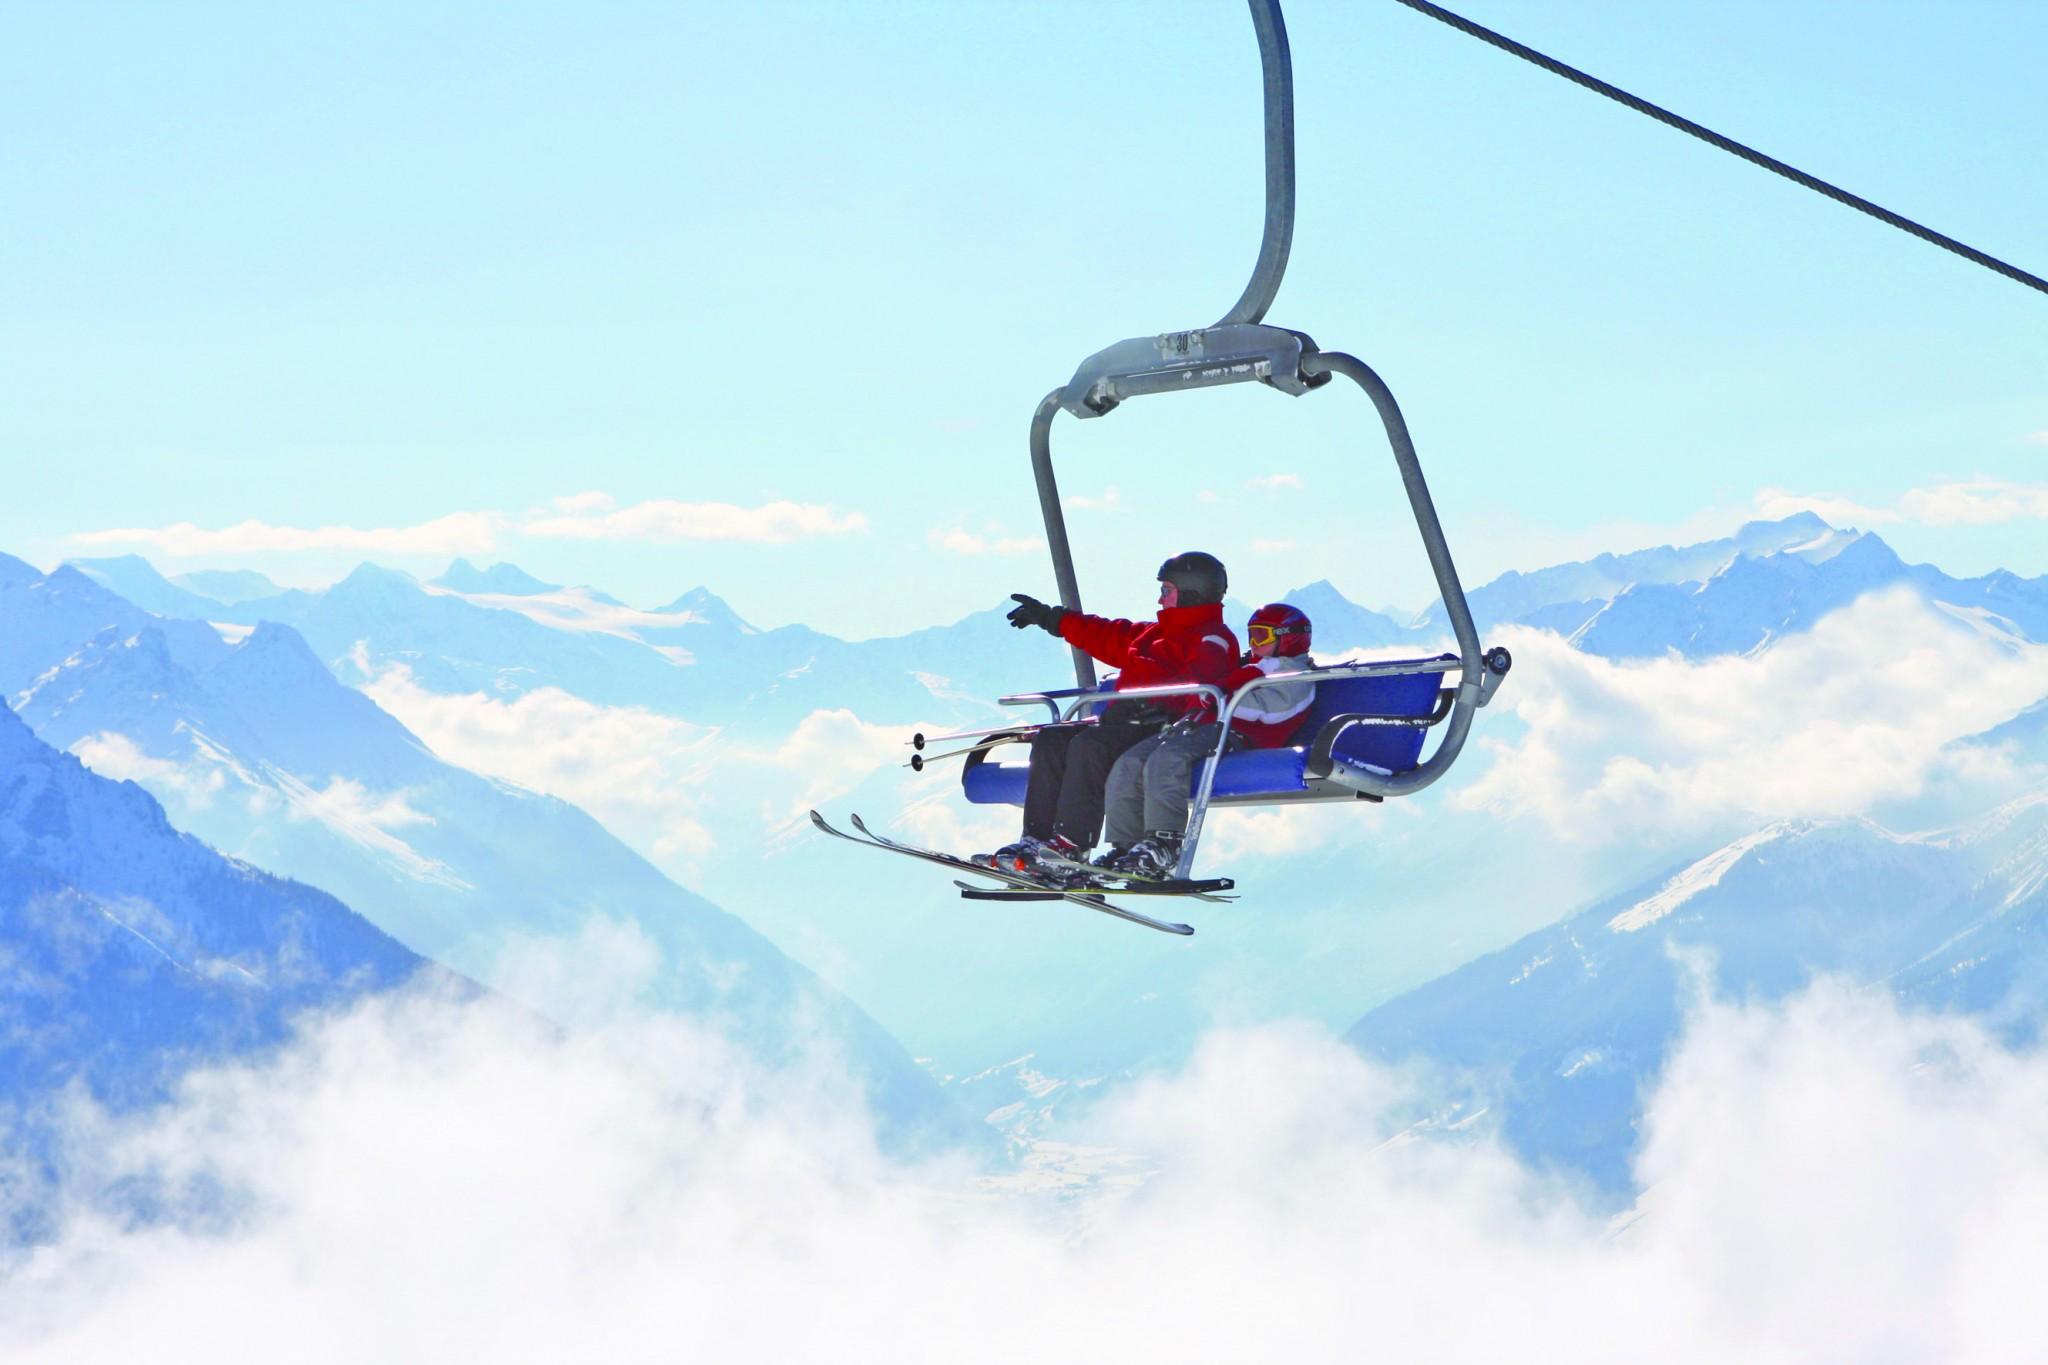 Igls Closest ski resorts to the UK